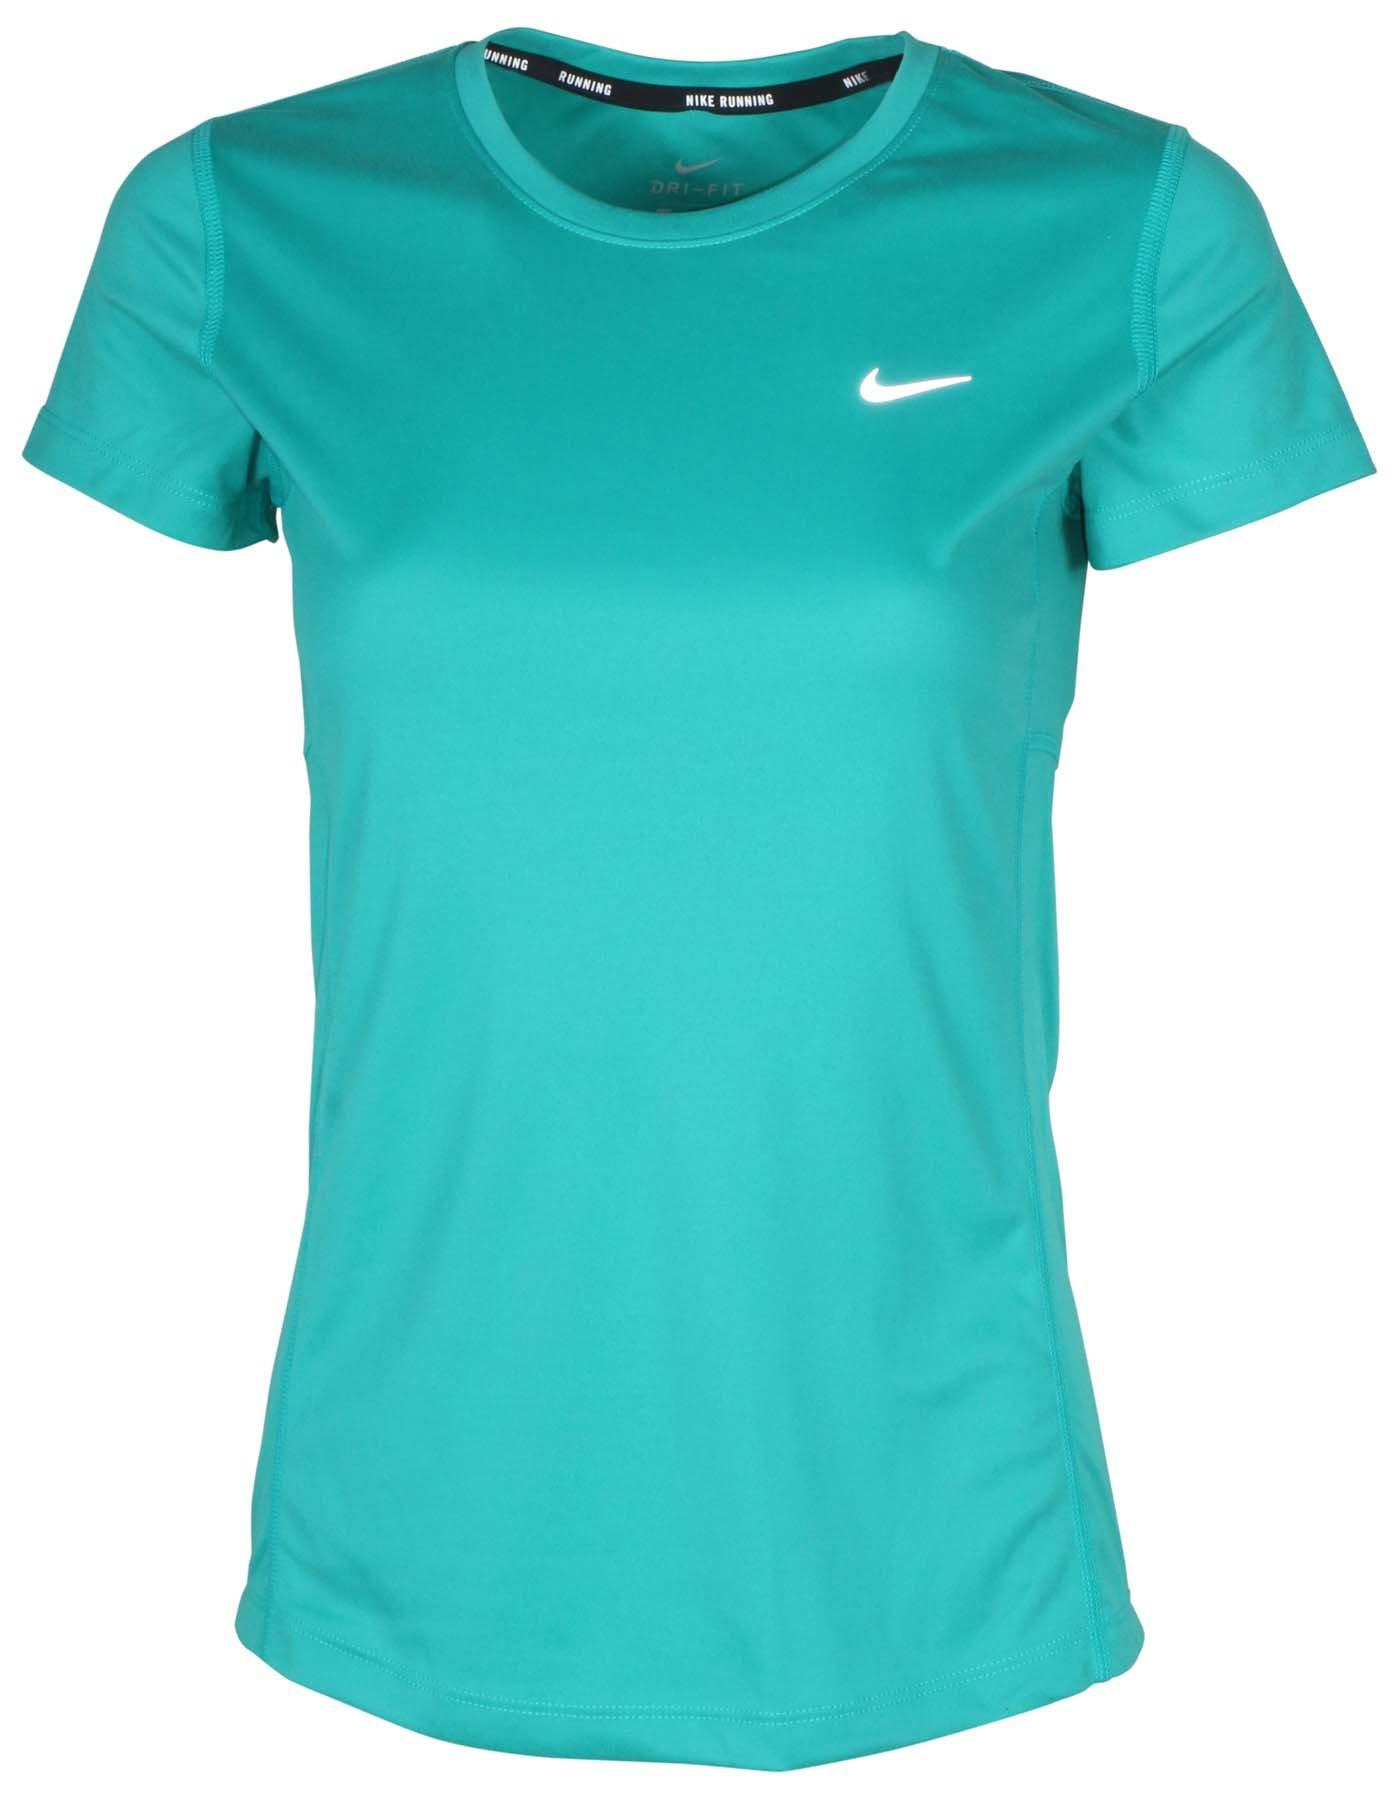 Nike Women's Dri-Fit Miler Running Top-Teal-Medium